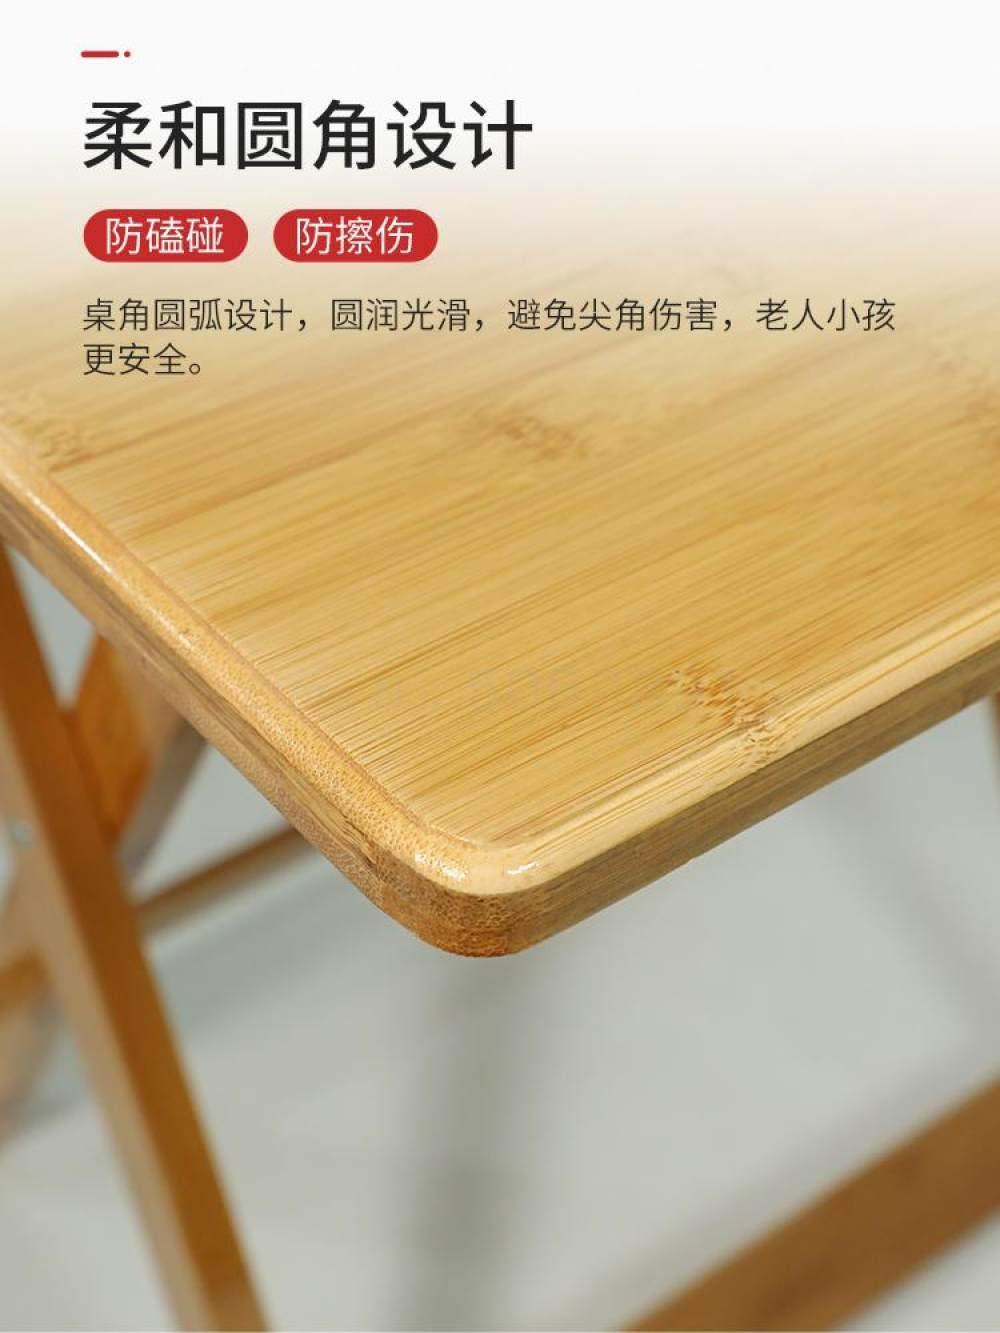 POXZPM matbord fällbart bord, litet bord, enkelt matbord, fyrkantigt bord, hushåll fyrkantigt bord, bambubord, samma som bild 4 Same as Picture 4